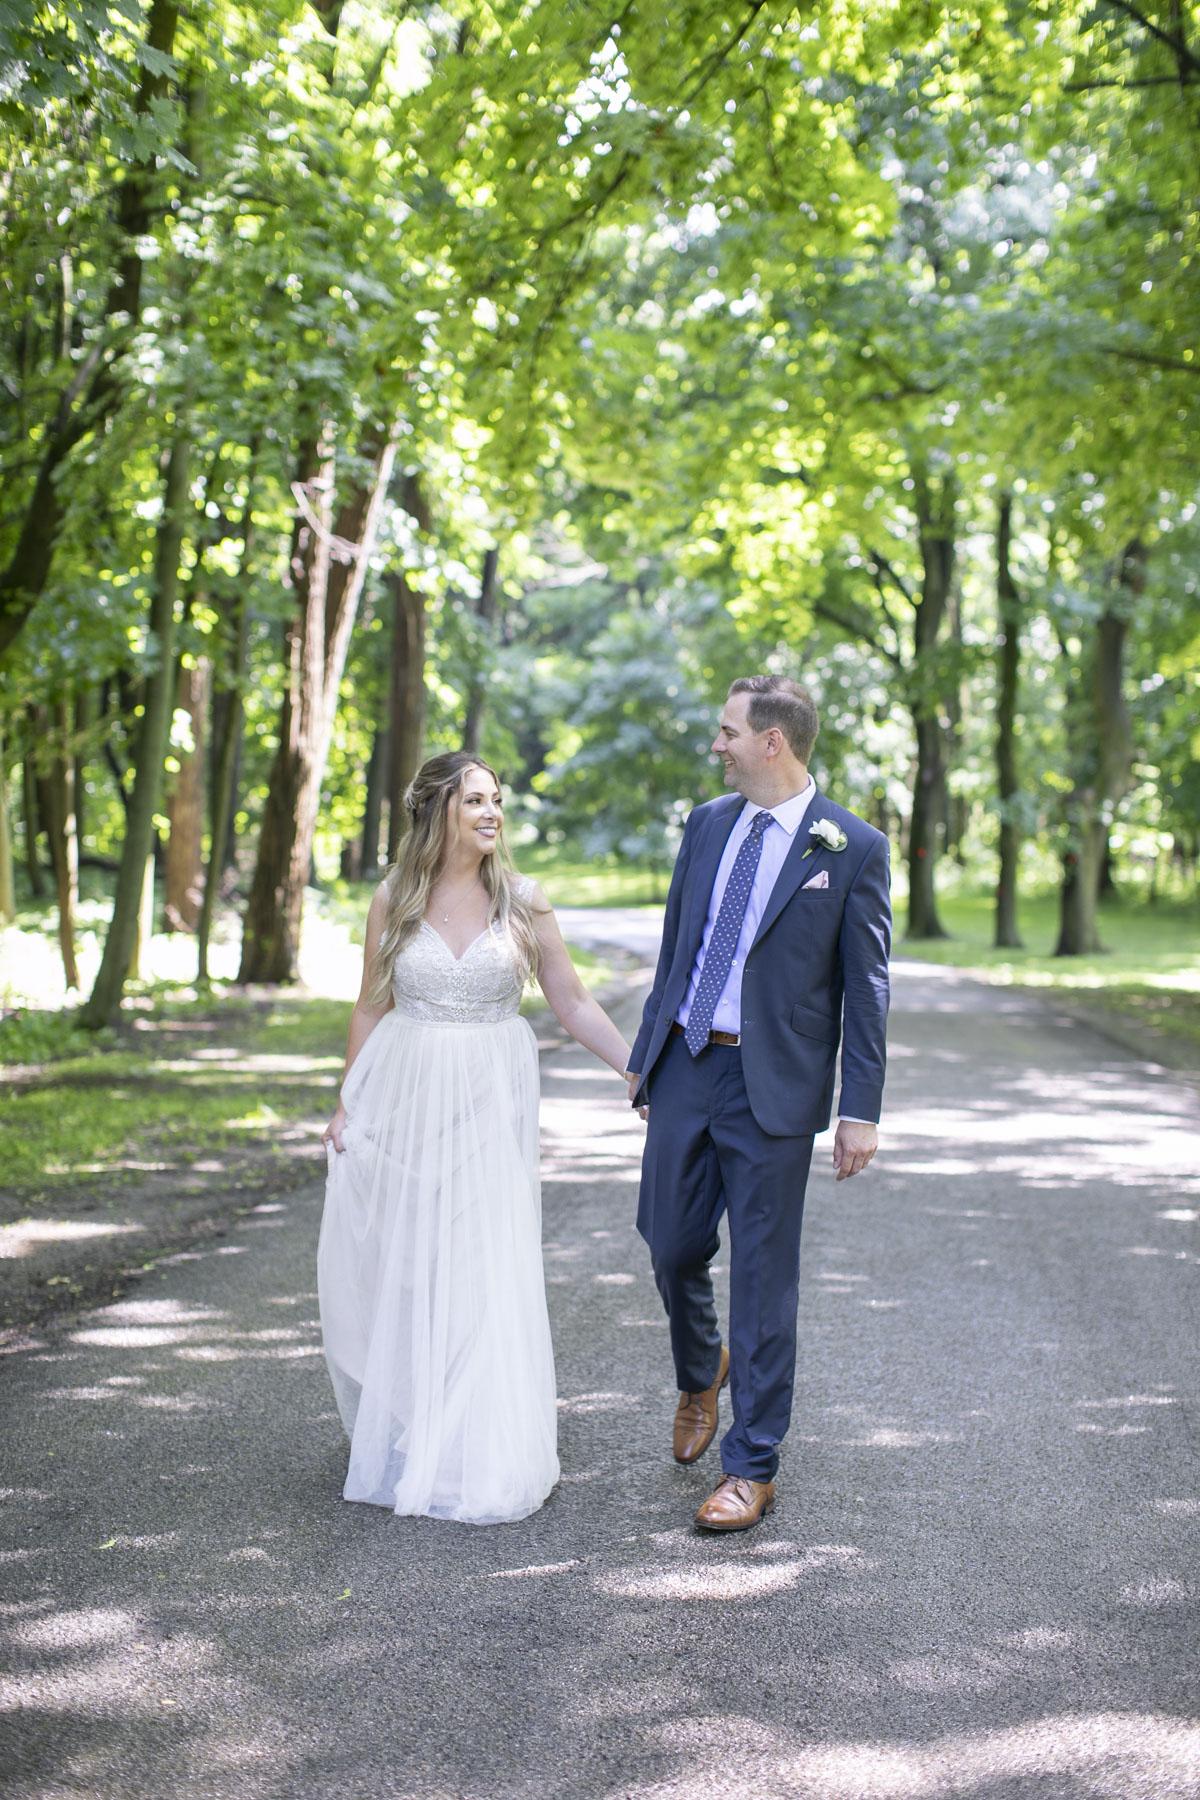 vineyard-bride-philosophy-studios-outdoor-summer-wedding-the-tamahaac-club-niagara-ancaster-toronto-vendor-0059.JPG